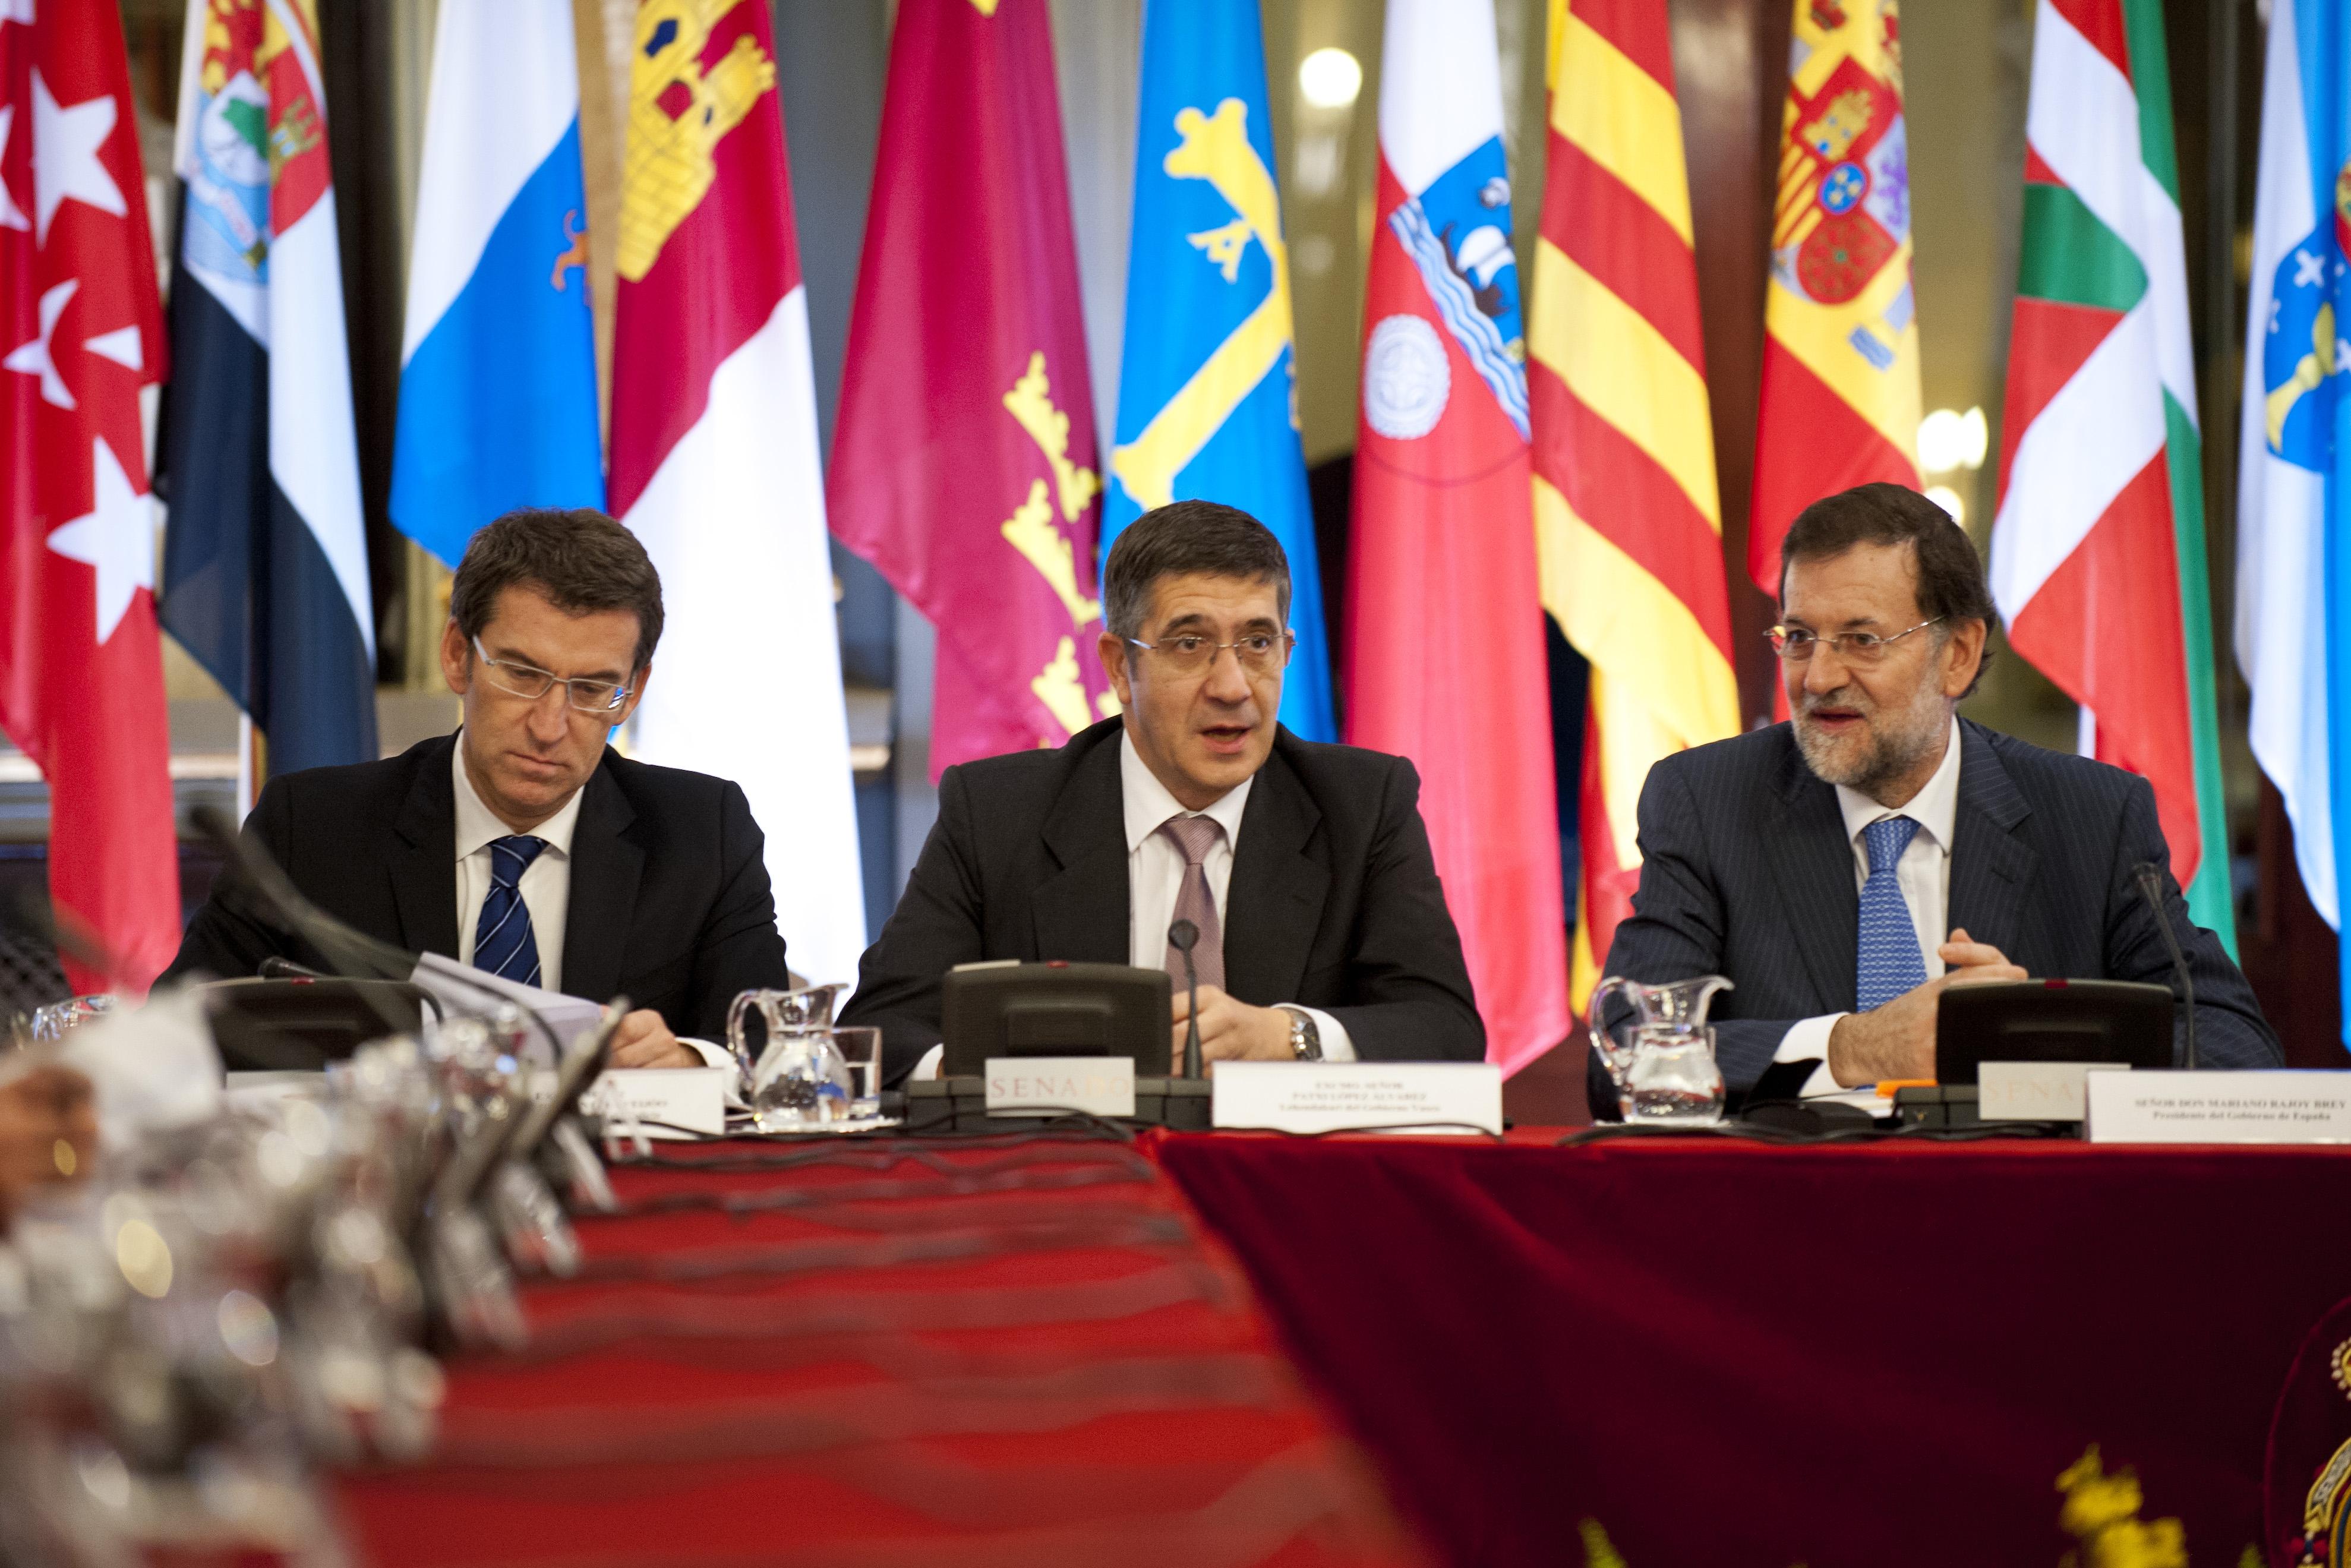 2012_10_02_confe_presidentes_152.jpg